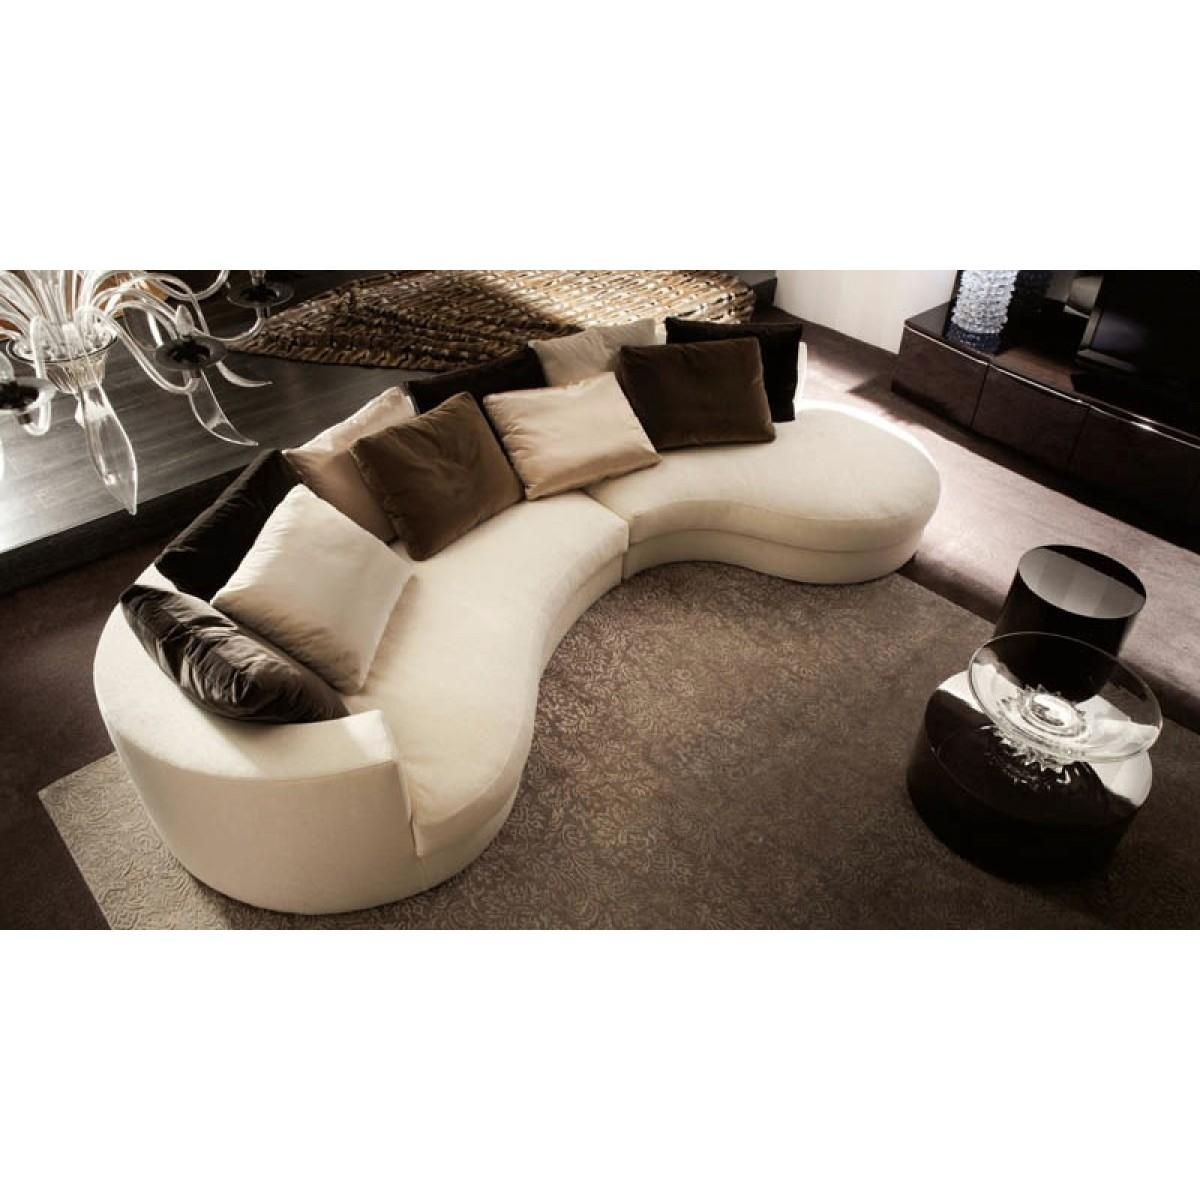 Sofas Center : Stirring Circle Sectional Sofa Photoncept Circular Regarding Semi Circular Sectional Sofas (Image 19 of 20)